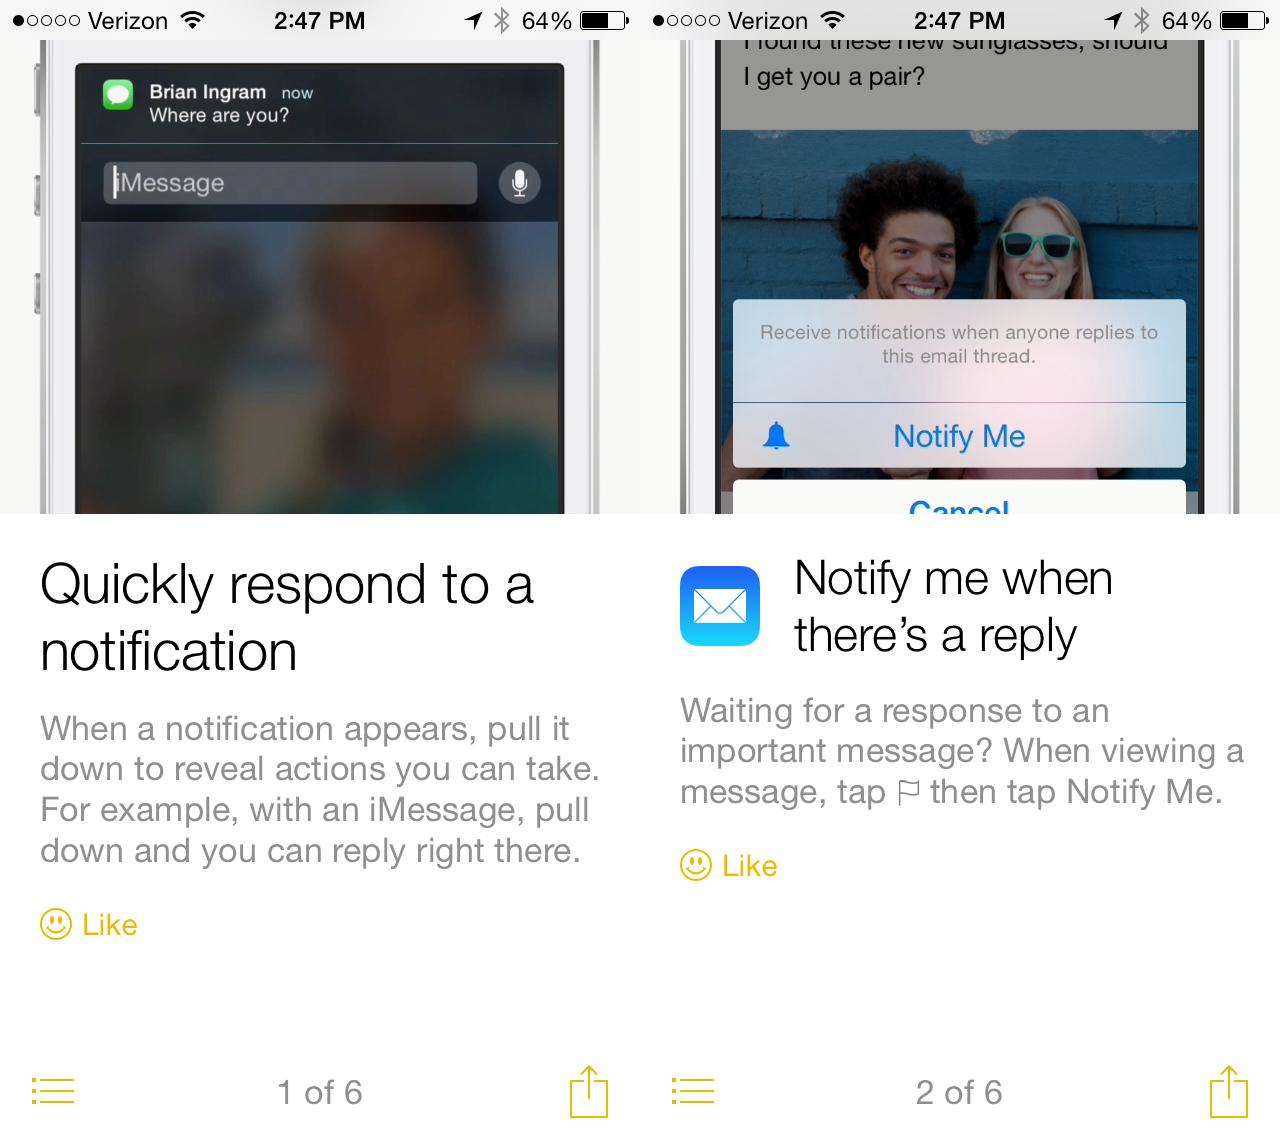 The iOS 8 Tips app showcases new iOS 8 features.